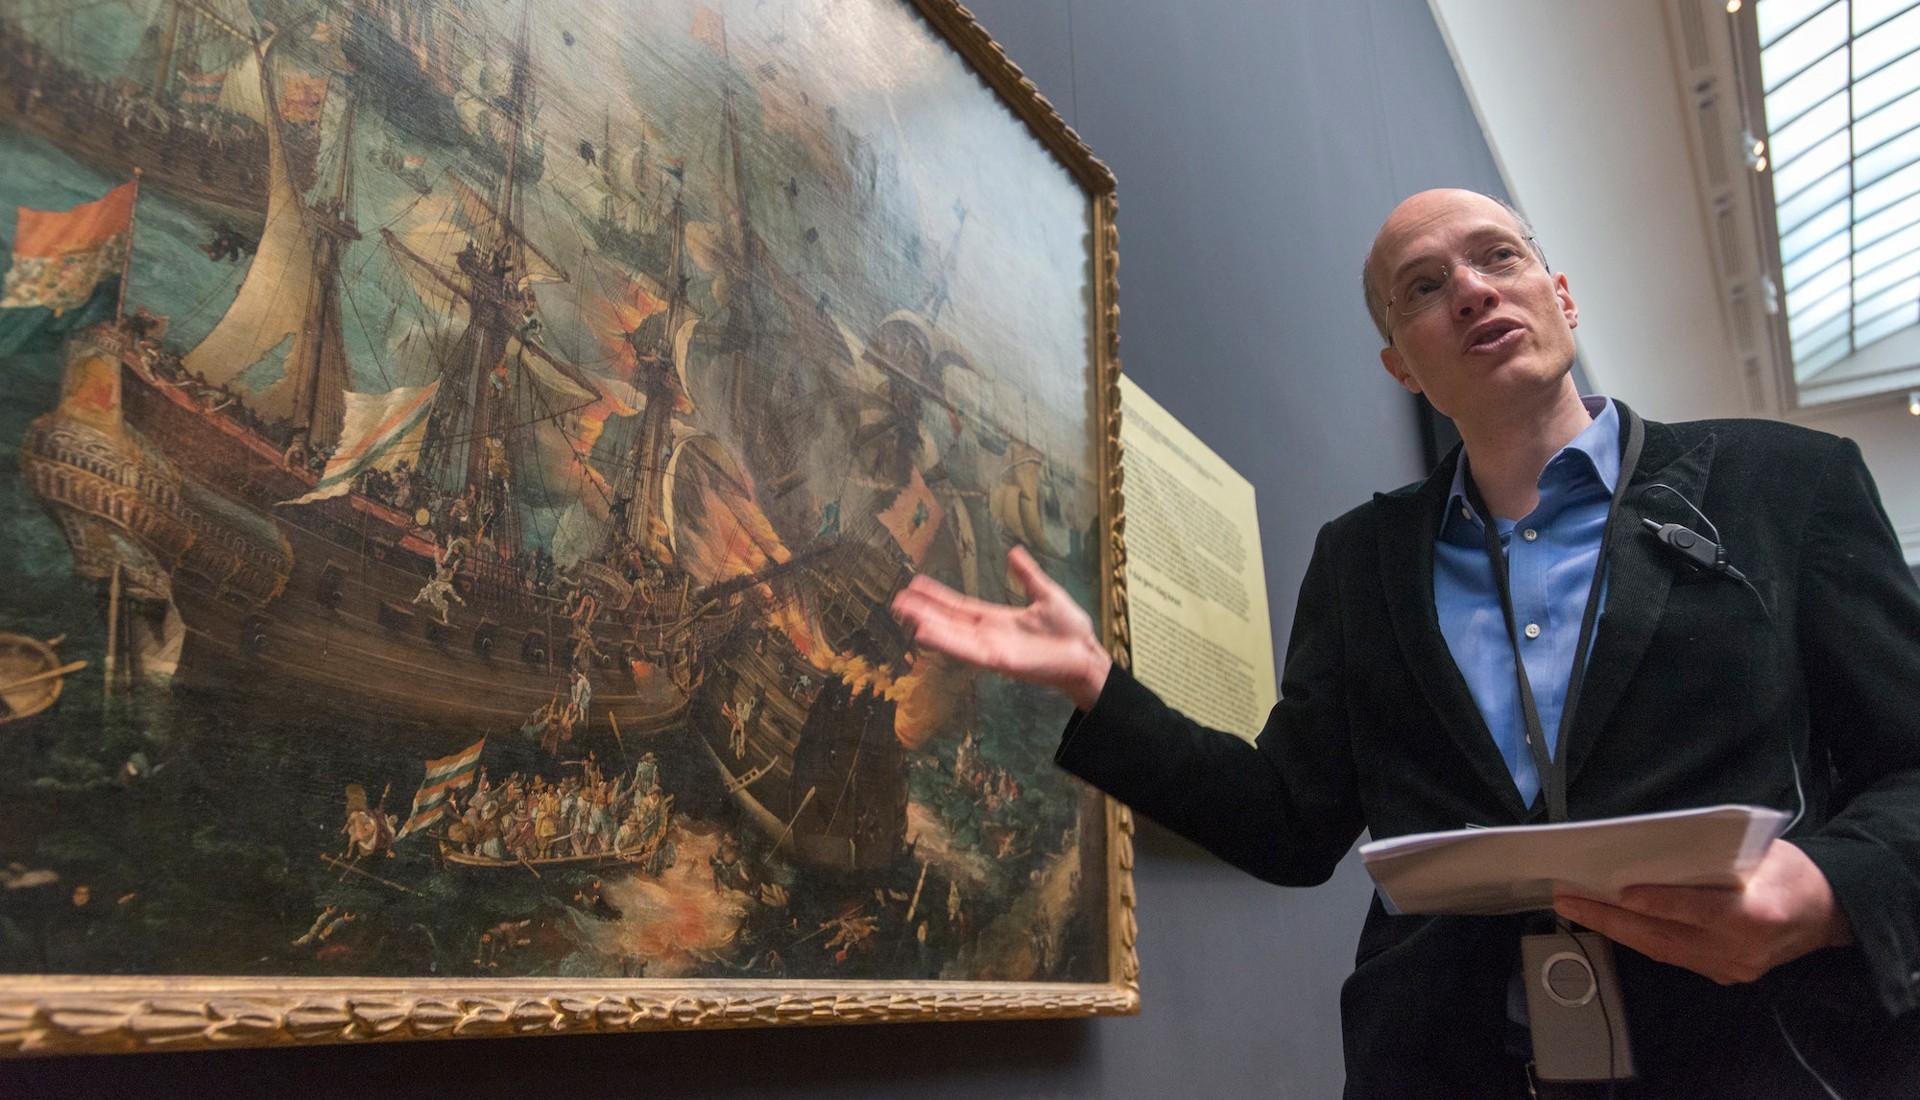 Alain de Botton explains The Battle of Gibraltar. Photo: Herman Wouters/Hollandse Hoogte